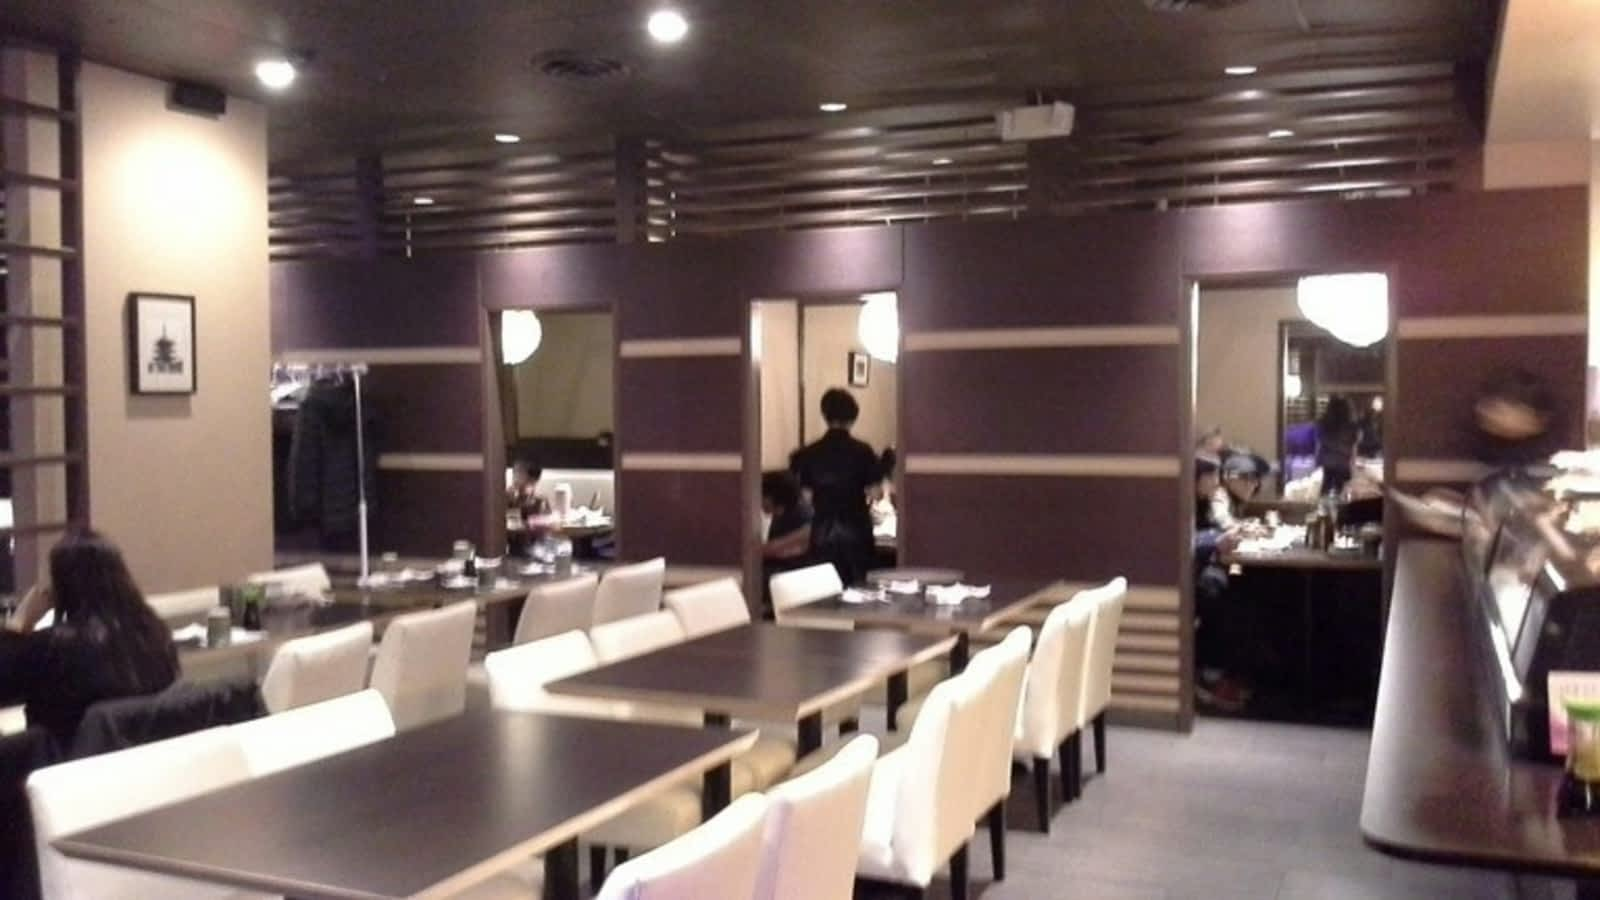 Aji sai japanese restaurant opening hours 8206 bayview for Aji sai asian cuisine